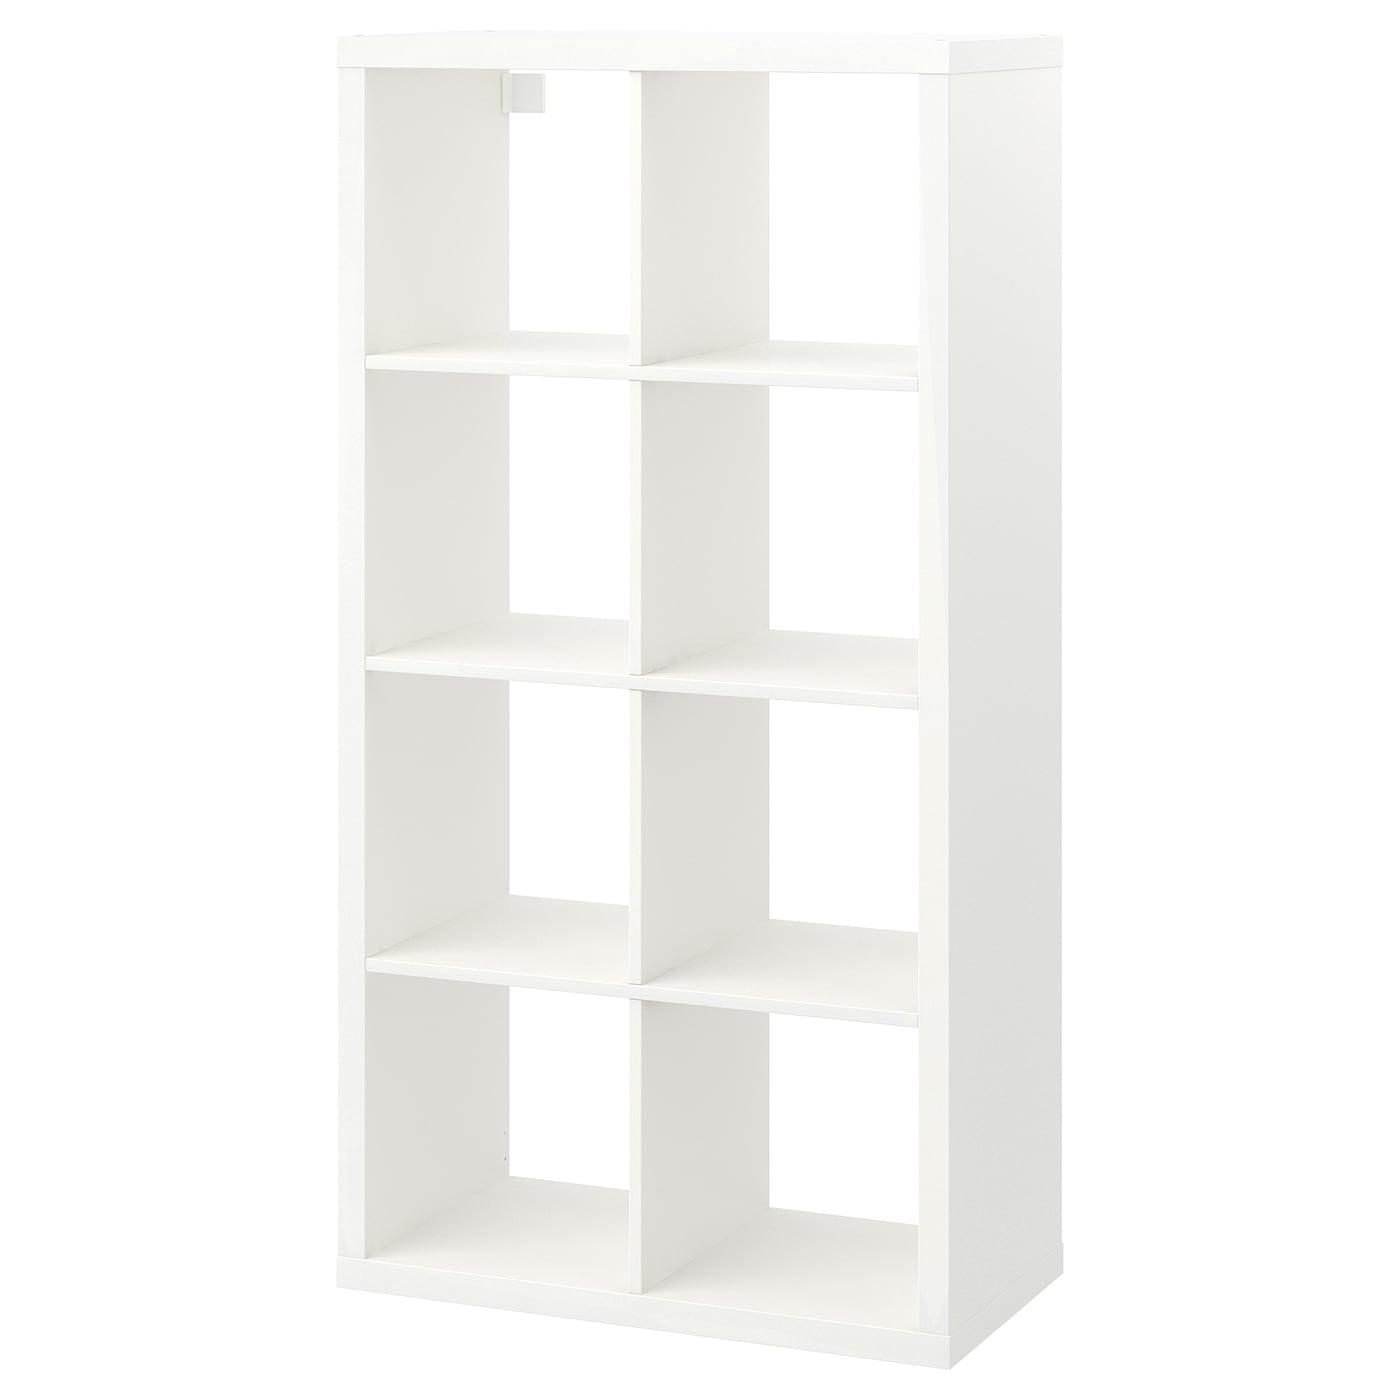 biblioth que sur mesure armoires tag res modulables ikea. Black Bedroom Furniture Sets. Home Design Ideas